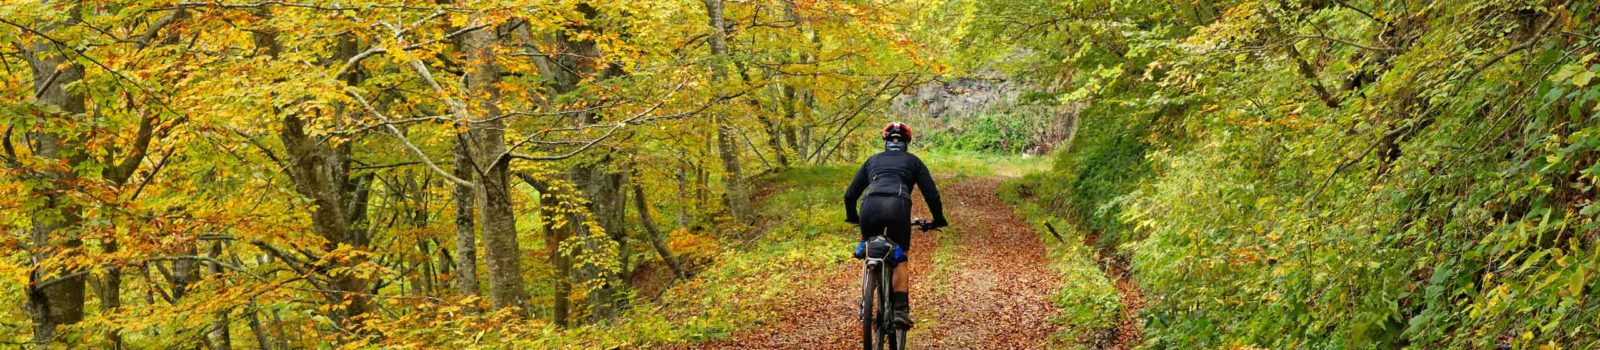 Bike-Tour mit Trailabfahrt bei Corniolo, Emilia-Romagna